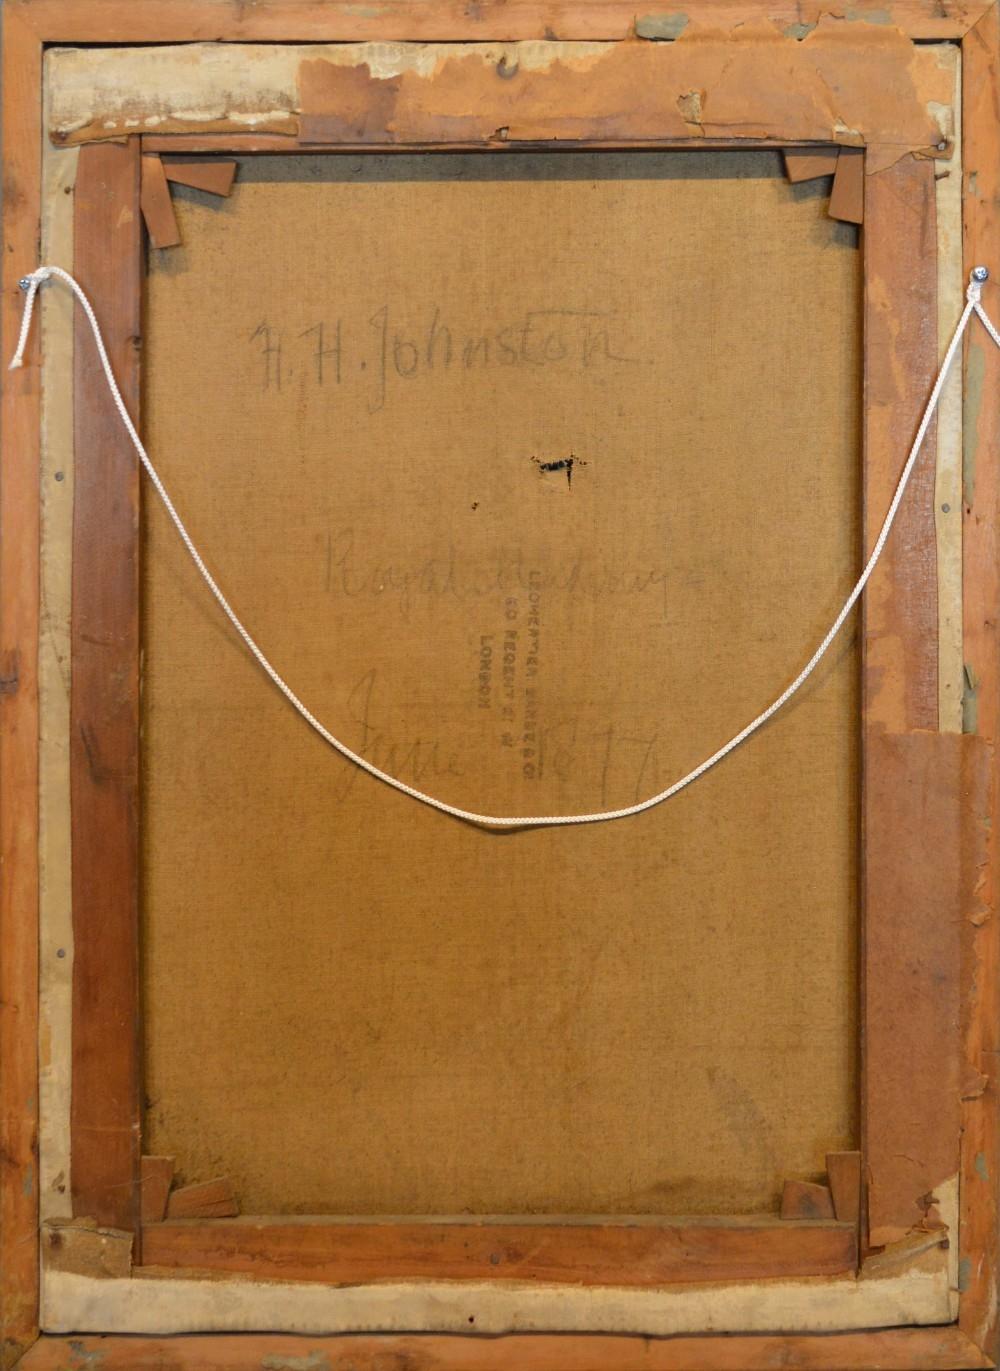 Lot 61 - Harry Hamilton Johnston, 1858-1927, England, Still Life with Carafe, oil on canvas, signed verso